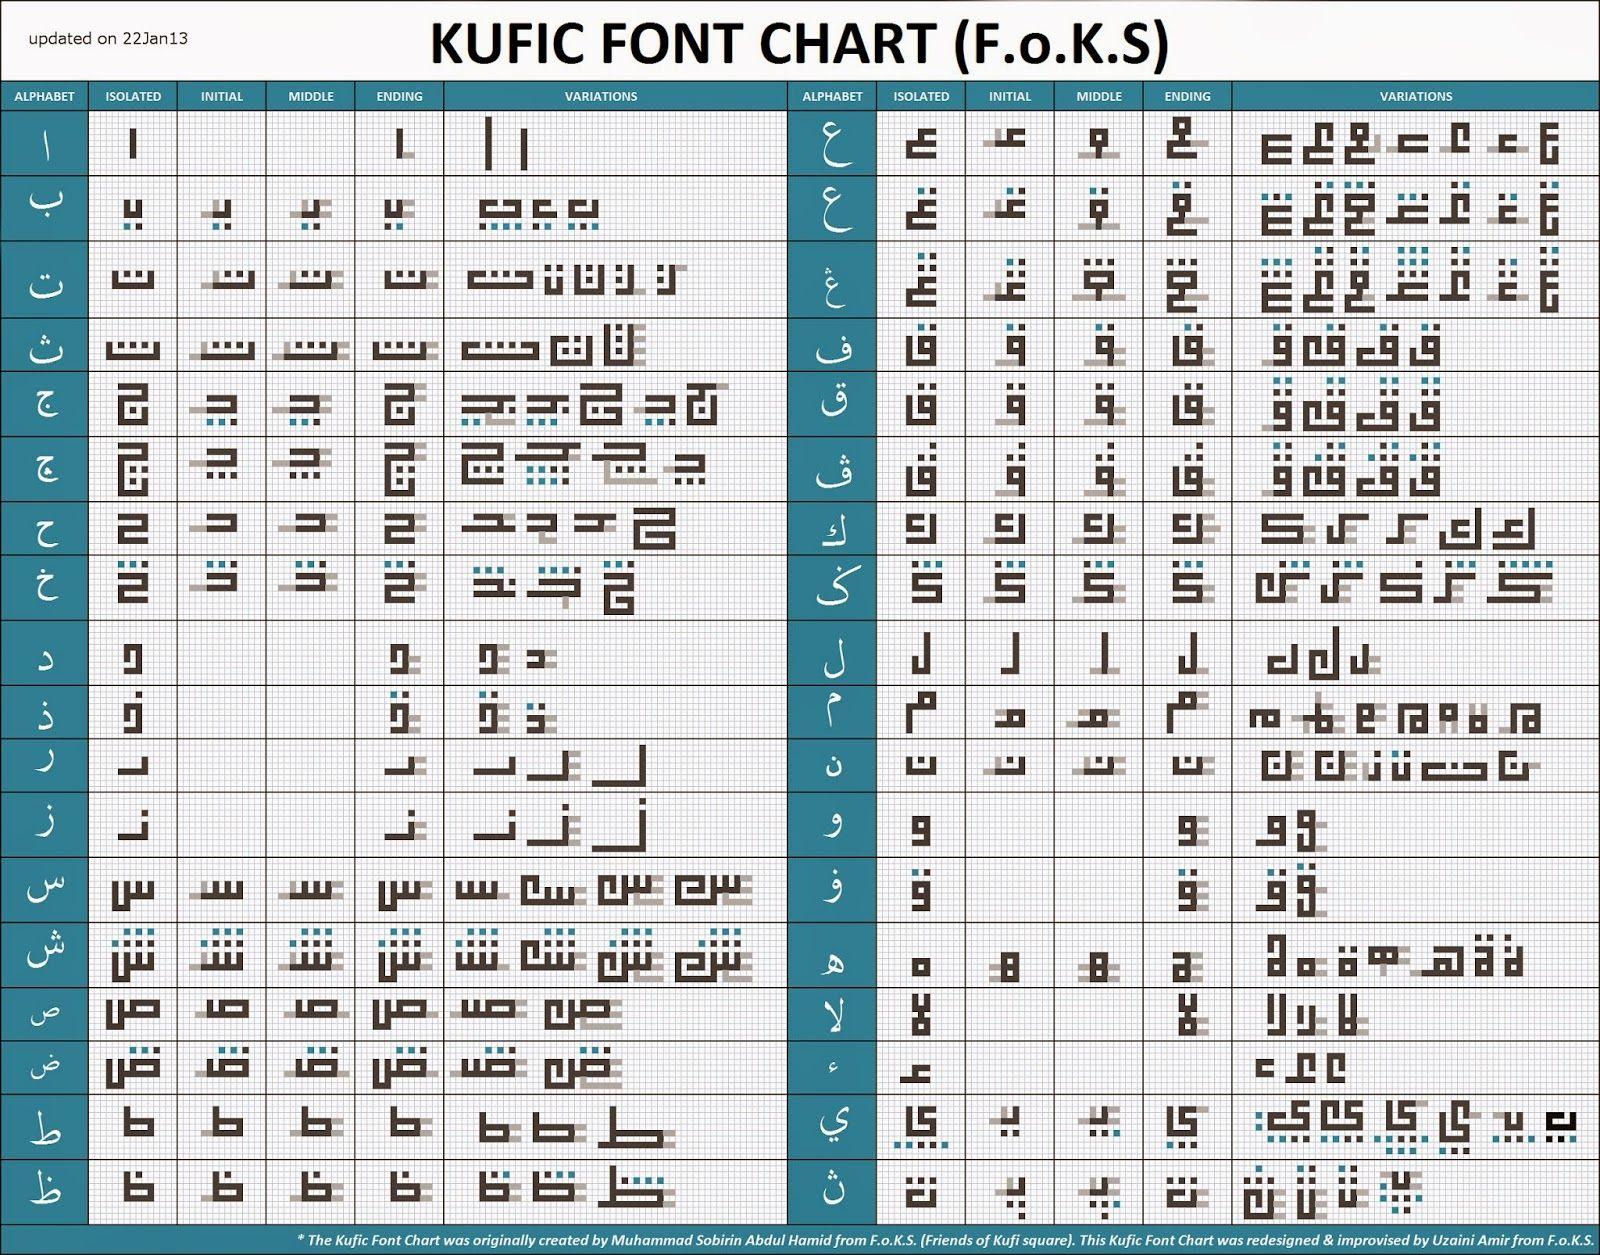 thekuficfontchart.jpg (1600×1255) Seni kaligrafi arab